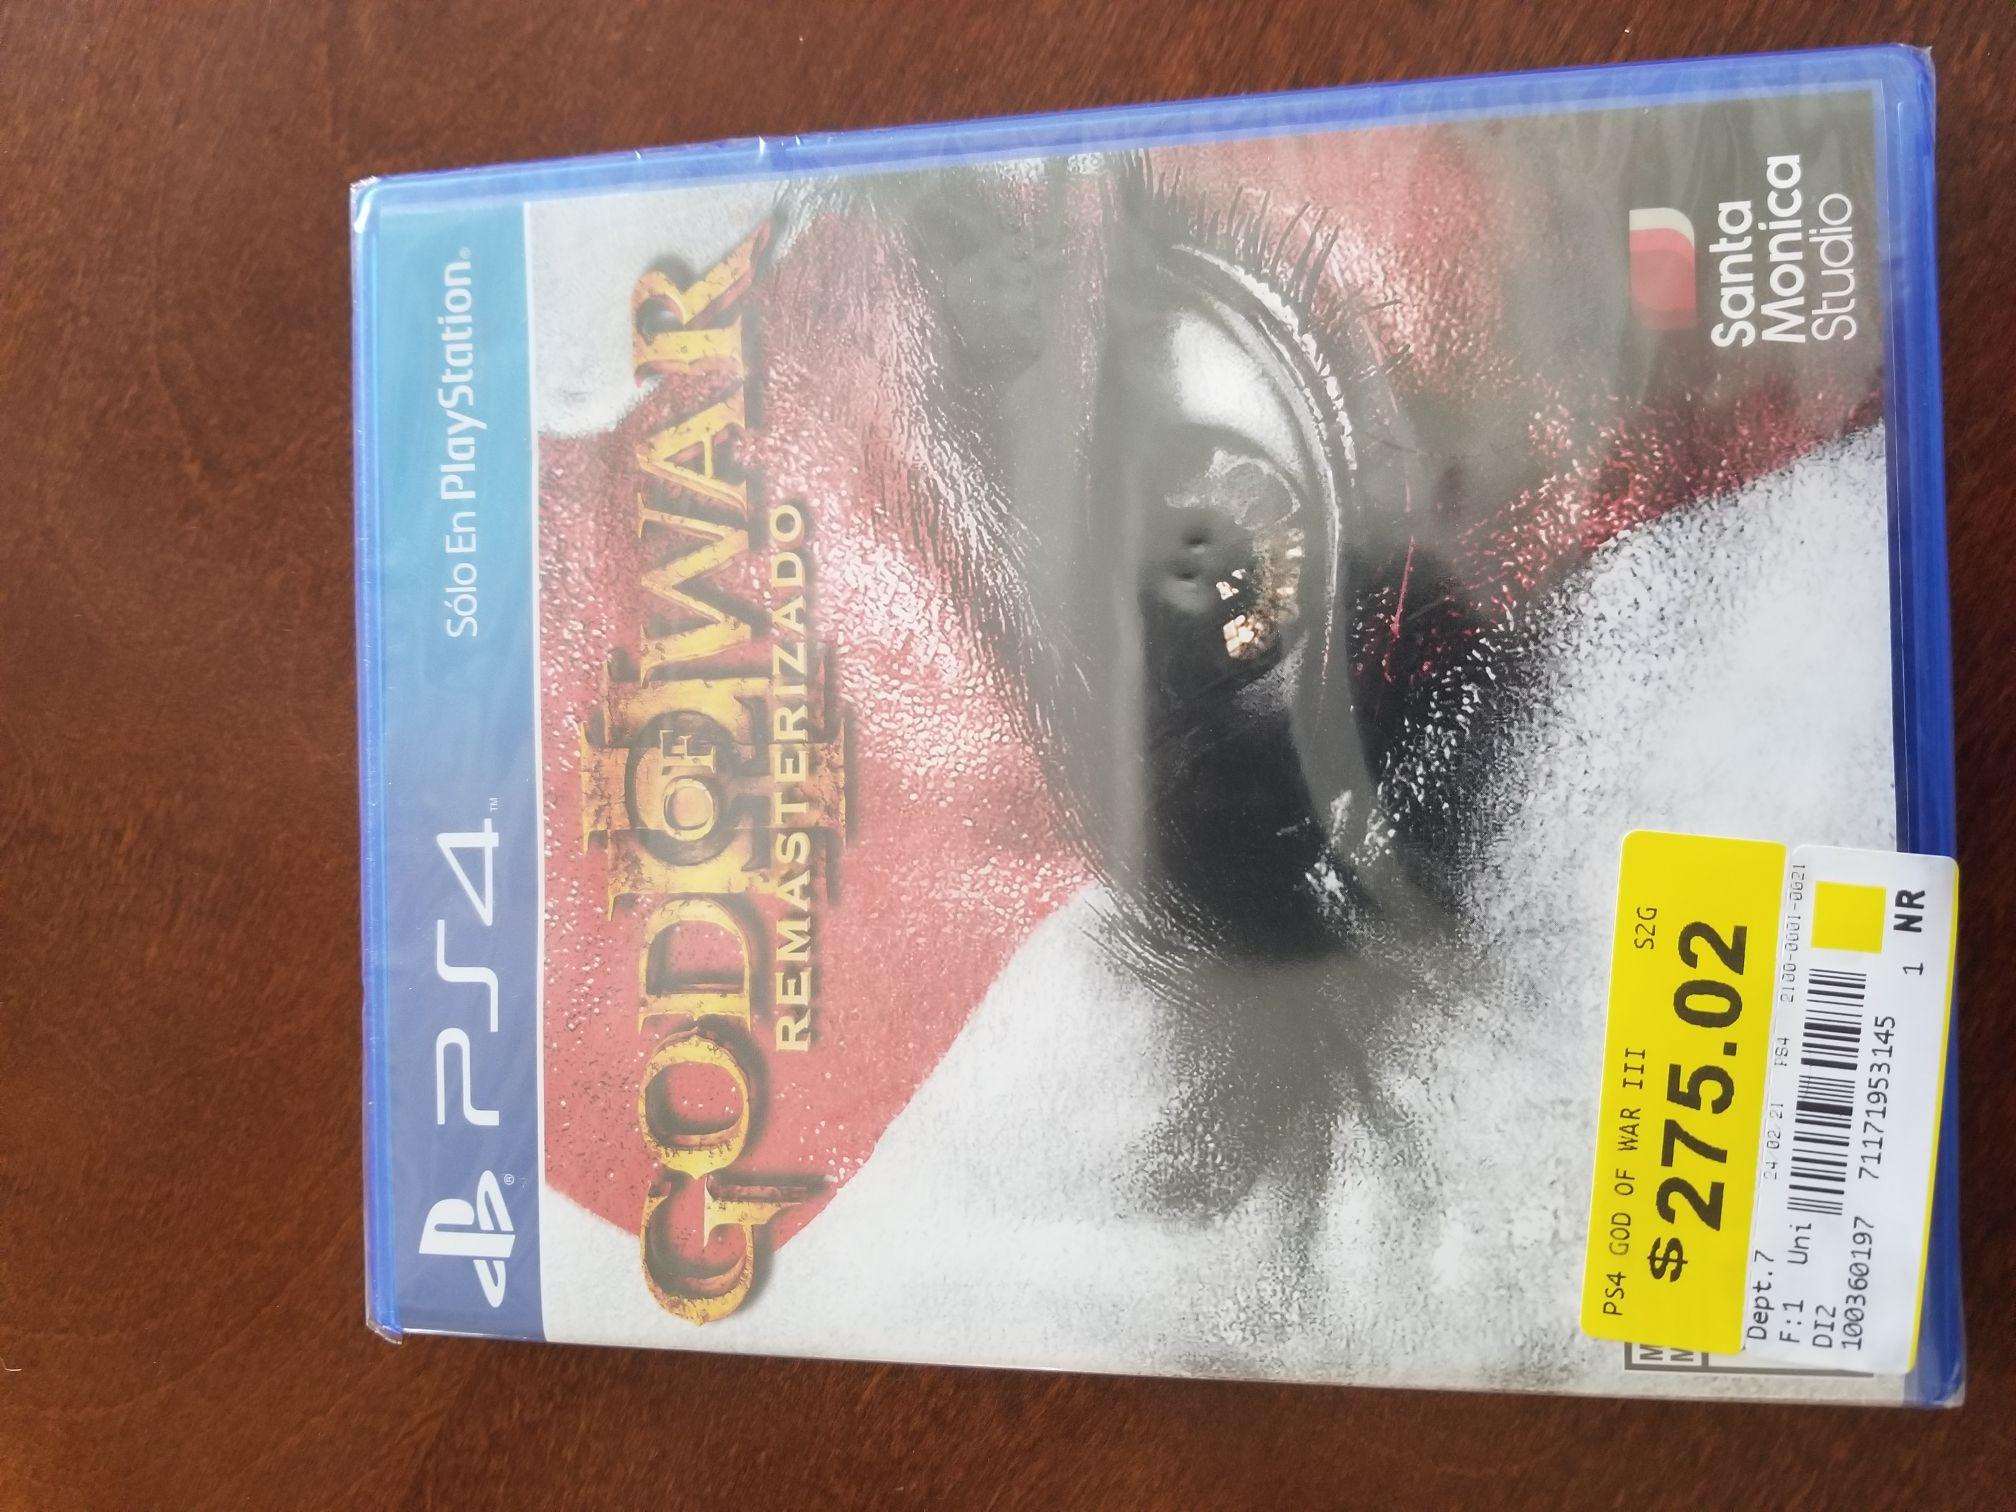 Bodega Aurrera: God of war 3 remasterizado, uncharted 4, the last of US remasterizado, horizon, gran turismo, ps4 (caja azul)